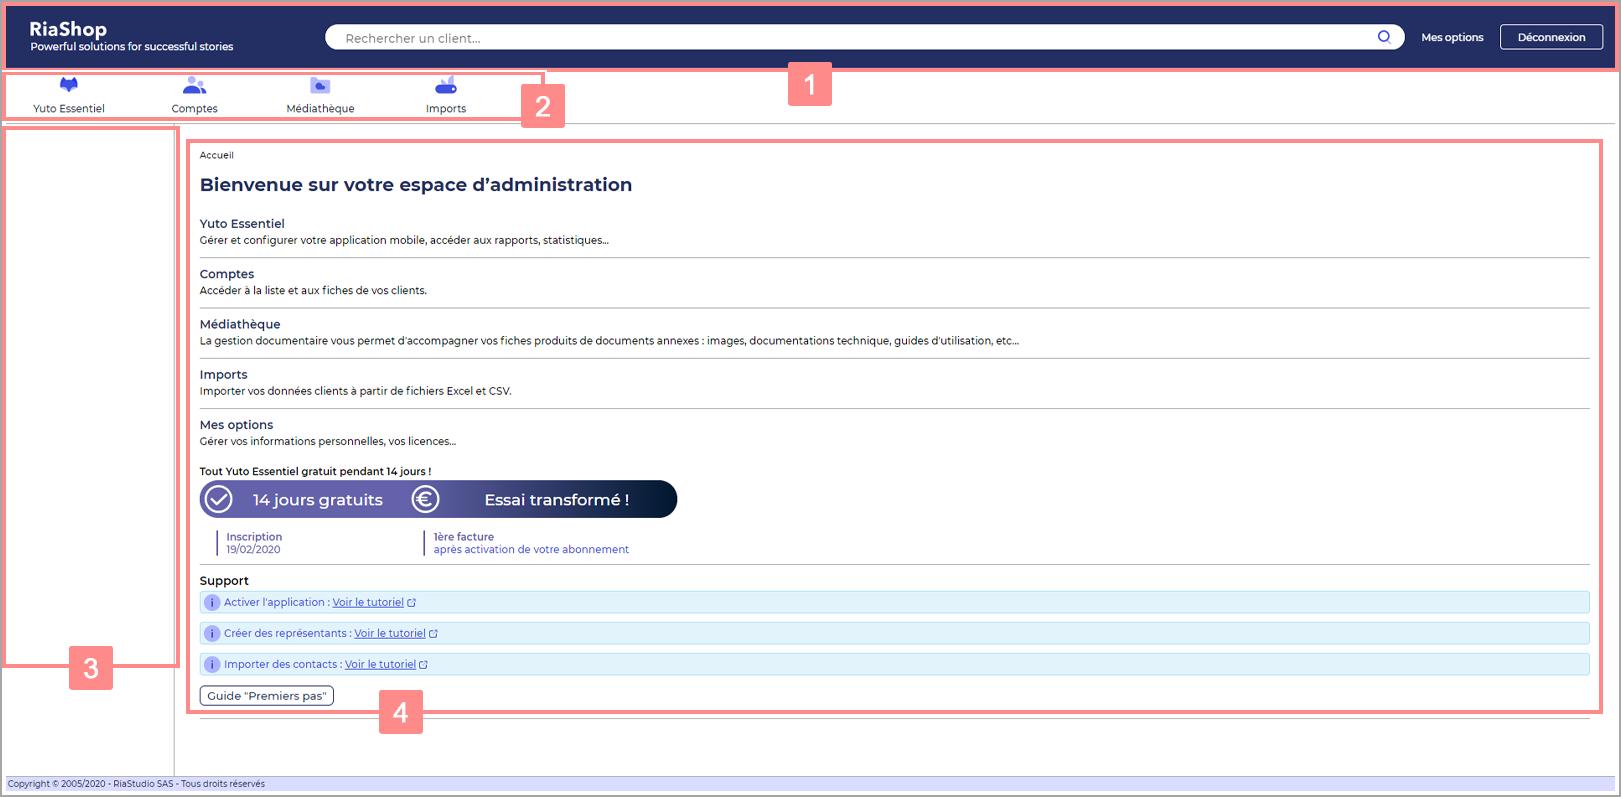 Page d'accueil de l'administration Yuto Essentiel